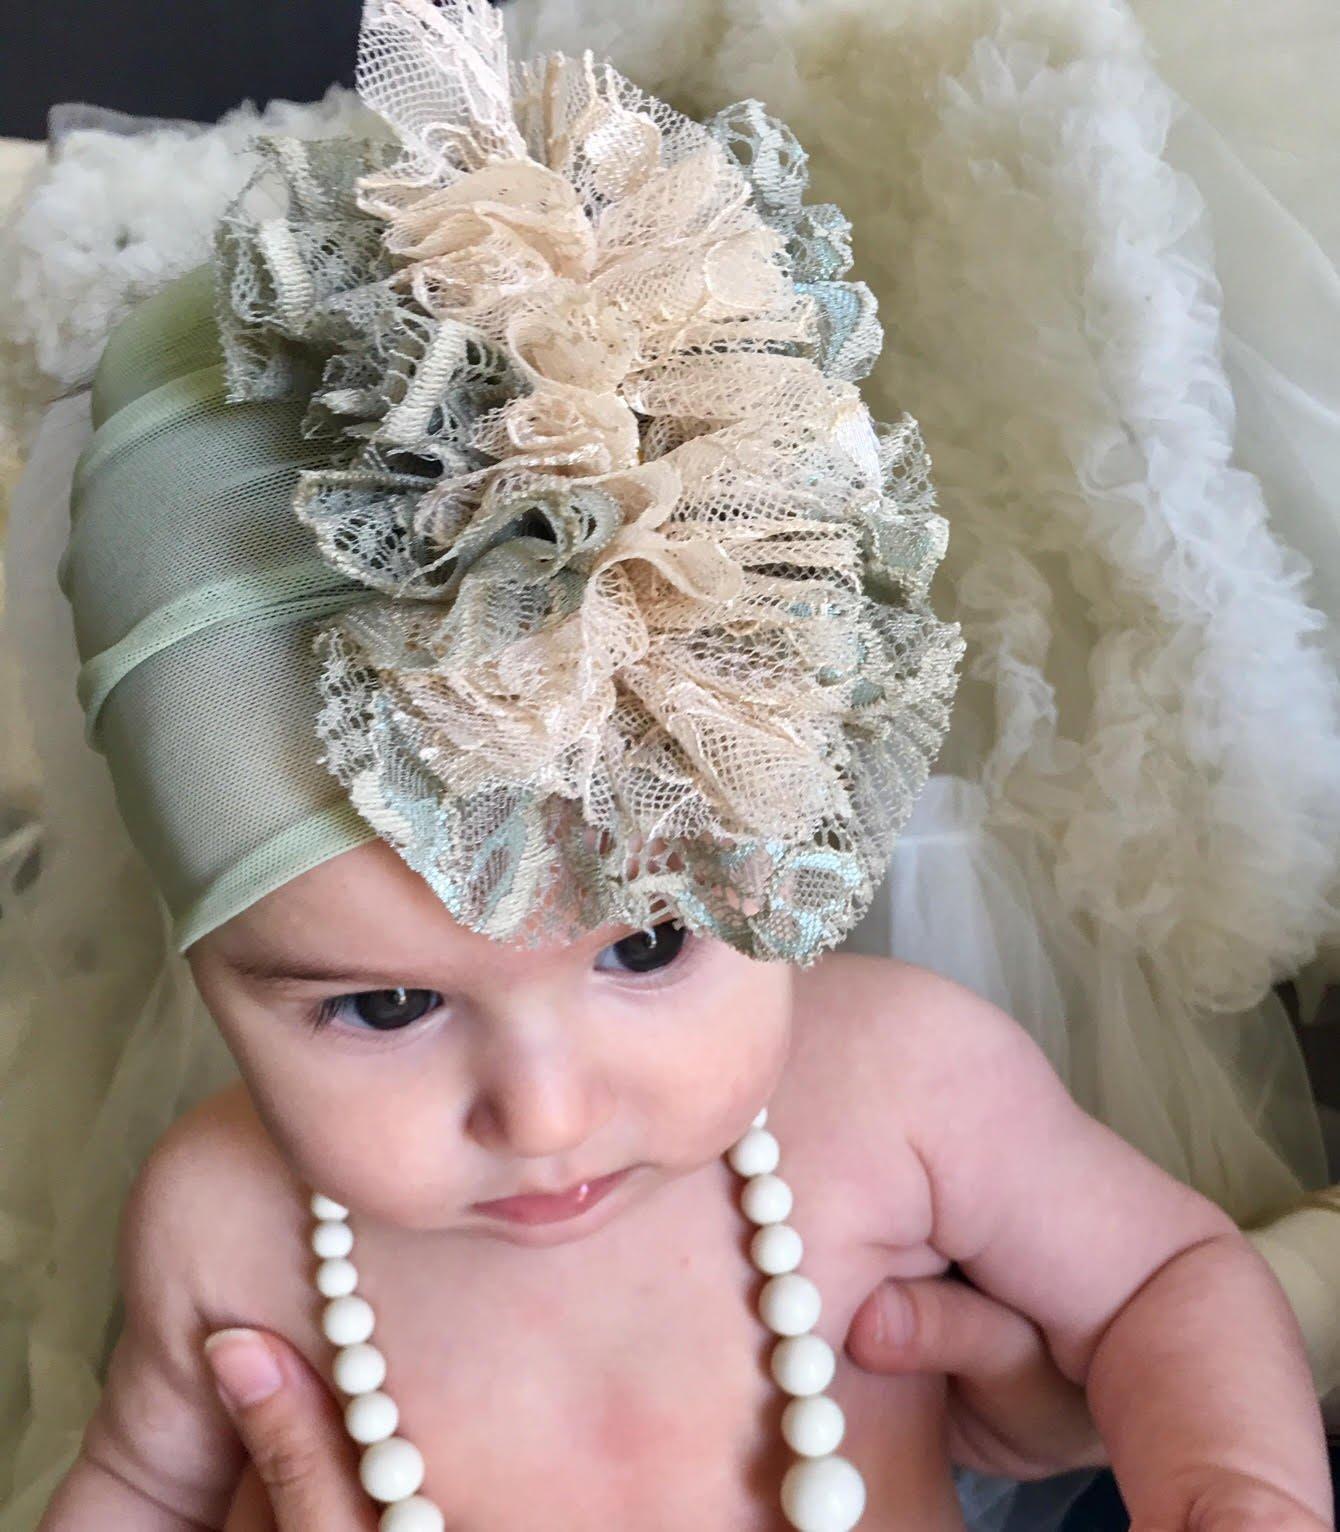 Handmade Green Baby Headband Made By Yasmine. 1-3 Years old, with Fabric Flower and Rhinestone